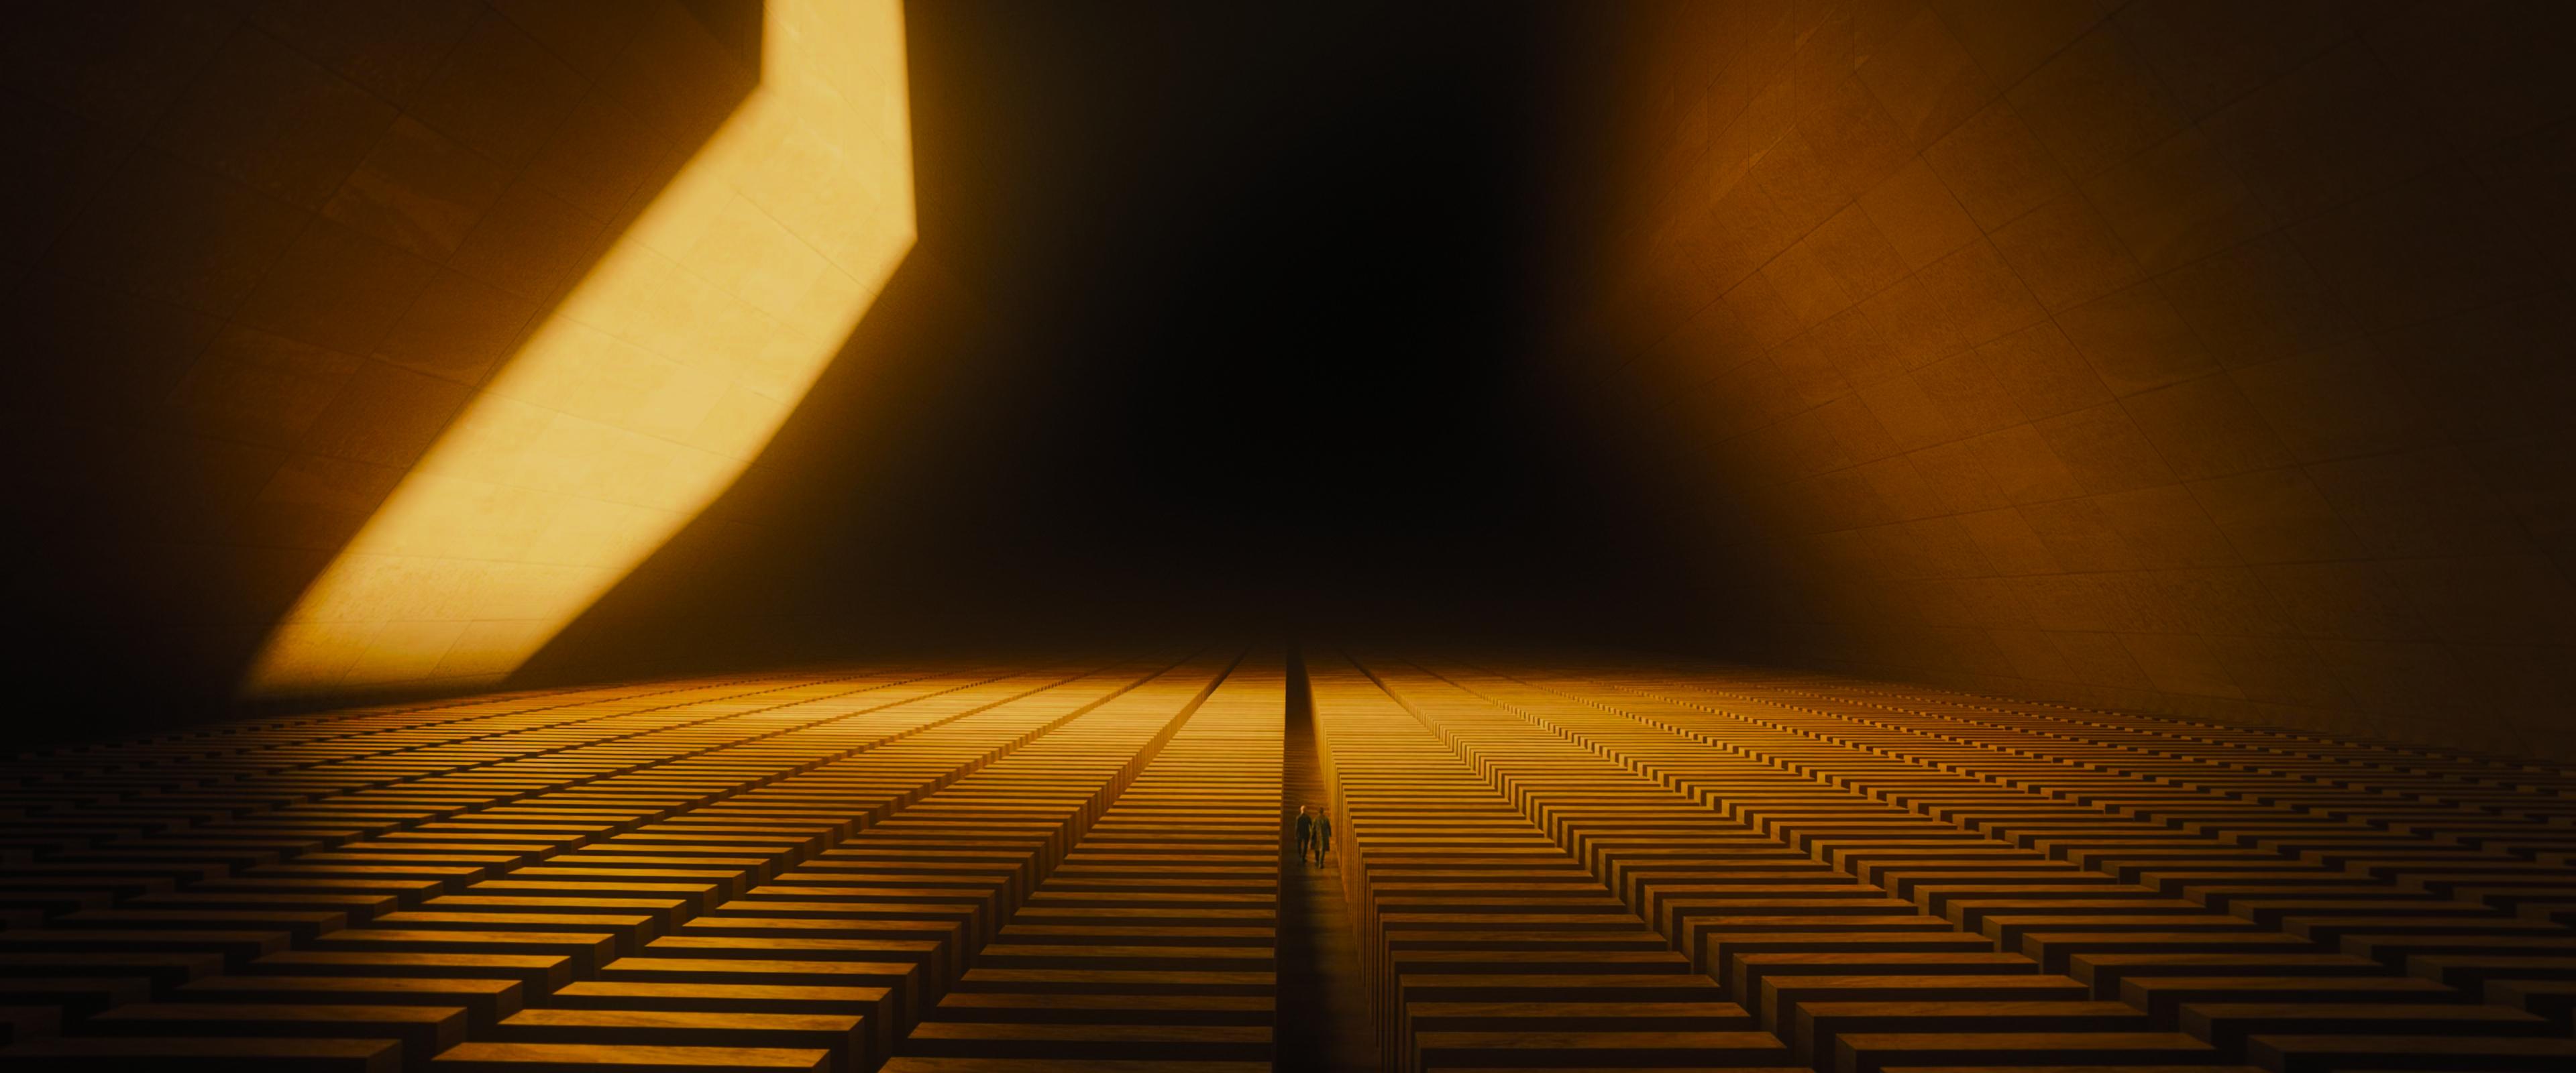 Blade Runner 2049 Wallpaper 4k Posted By Ryan Sellers